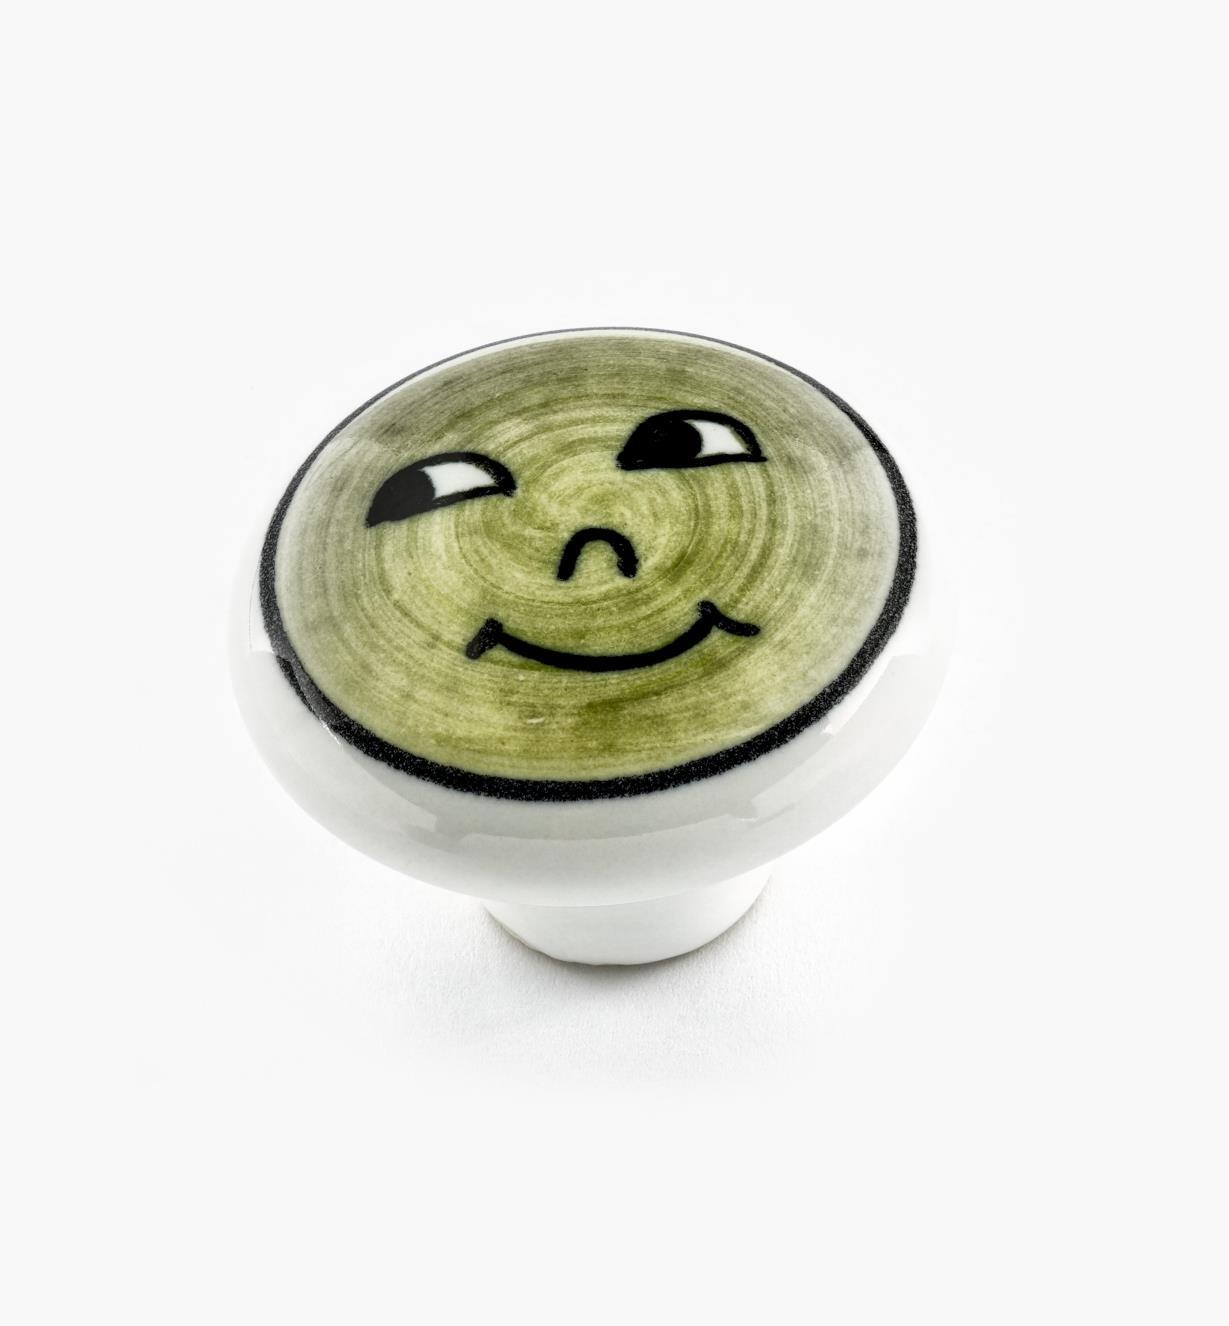 00W5305 - Green Face Knob